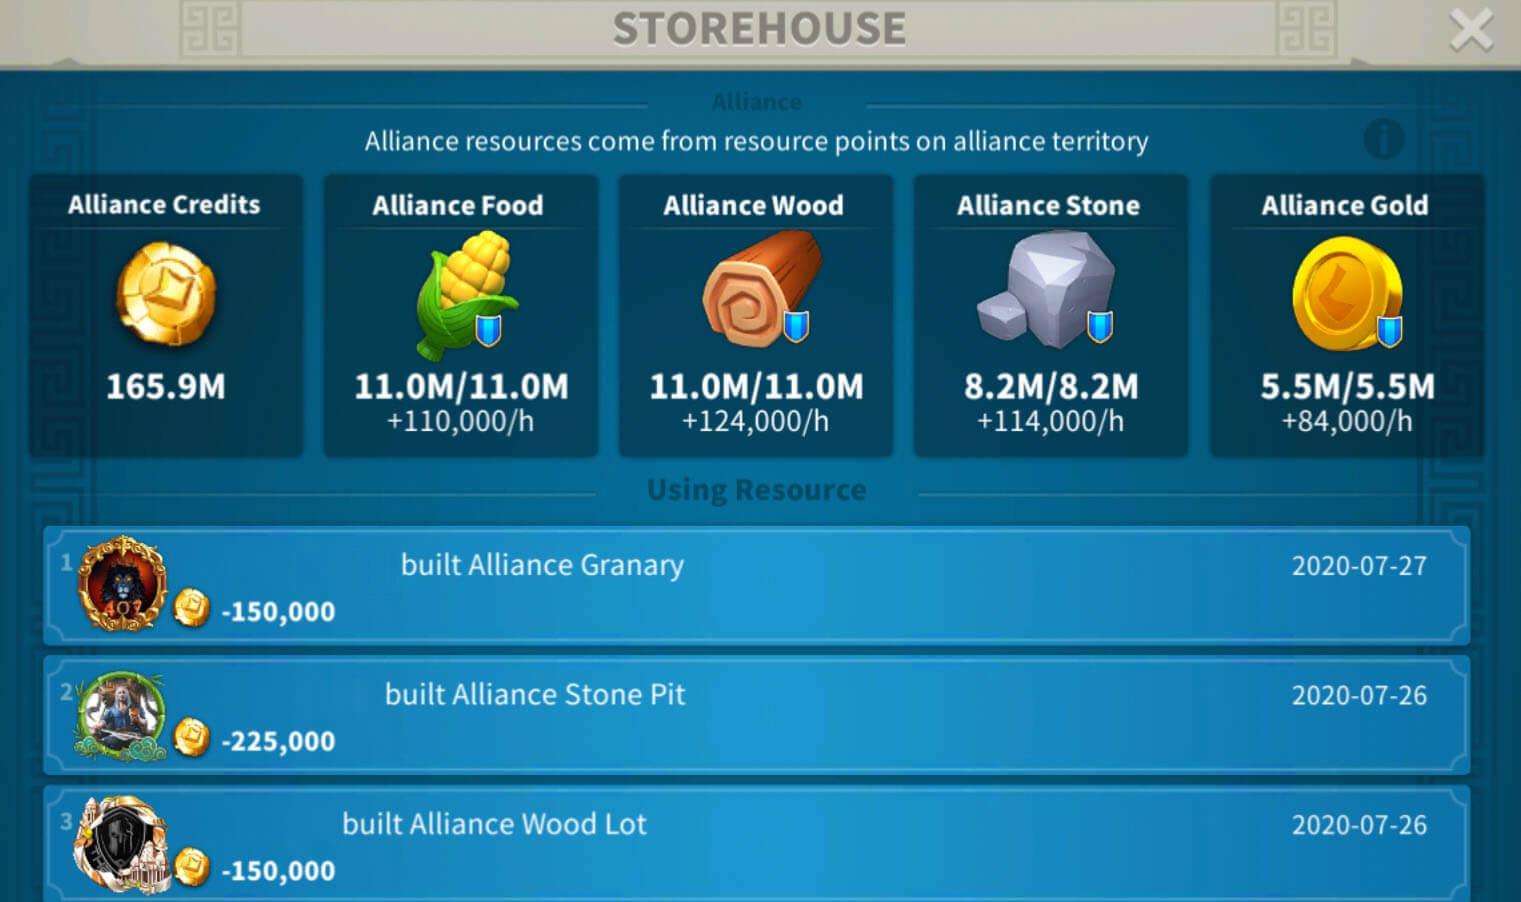 alliance storehouse